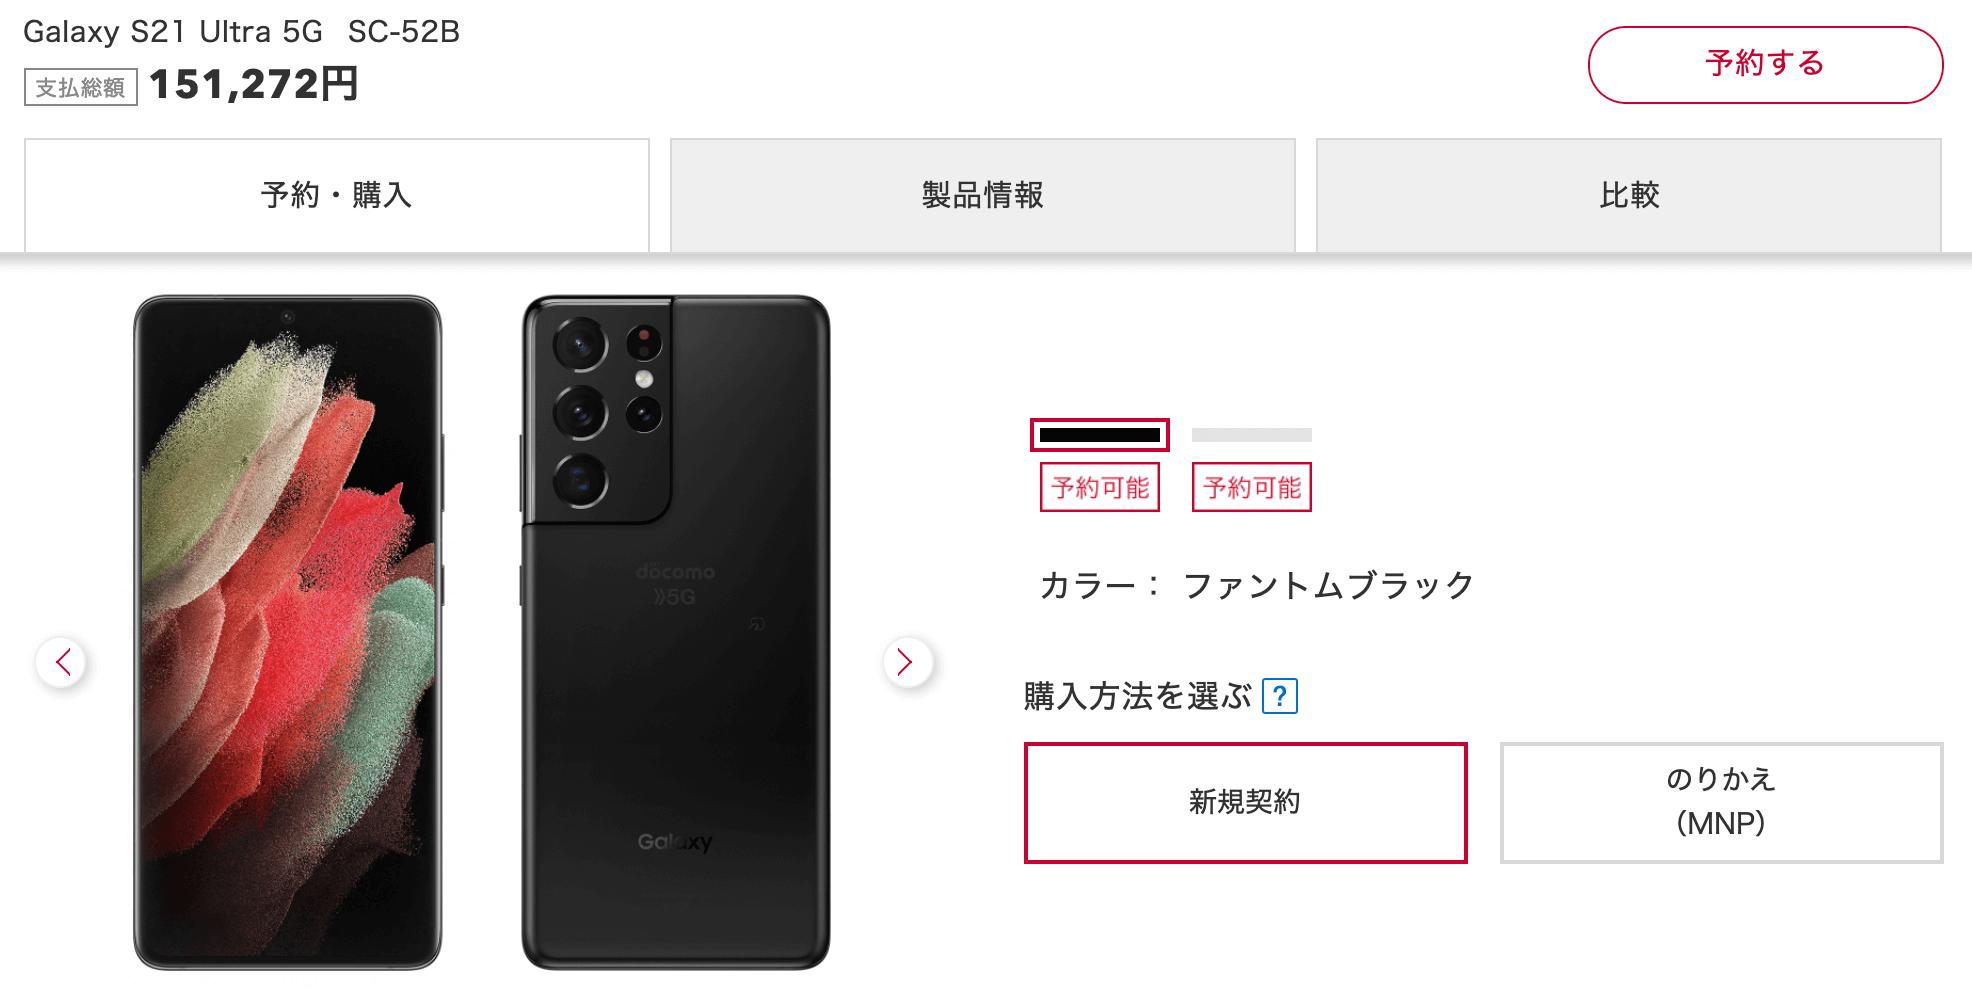 Galaxy S21 Ultra 5Gの価格